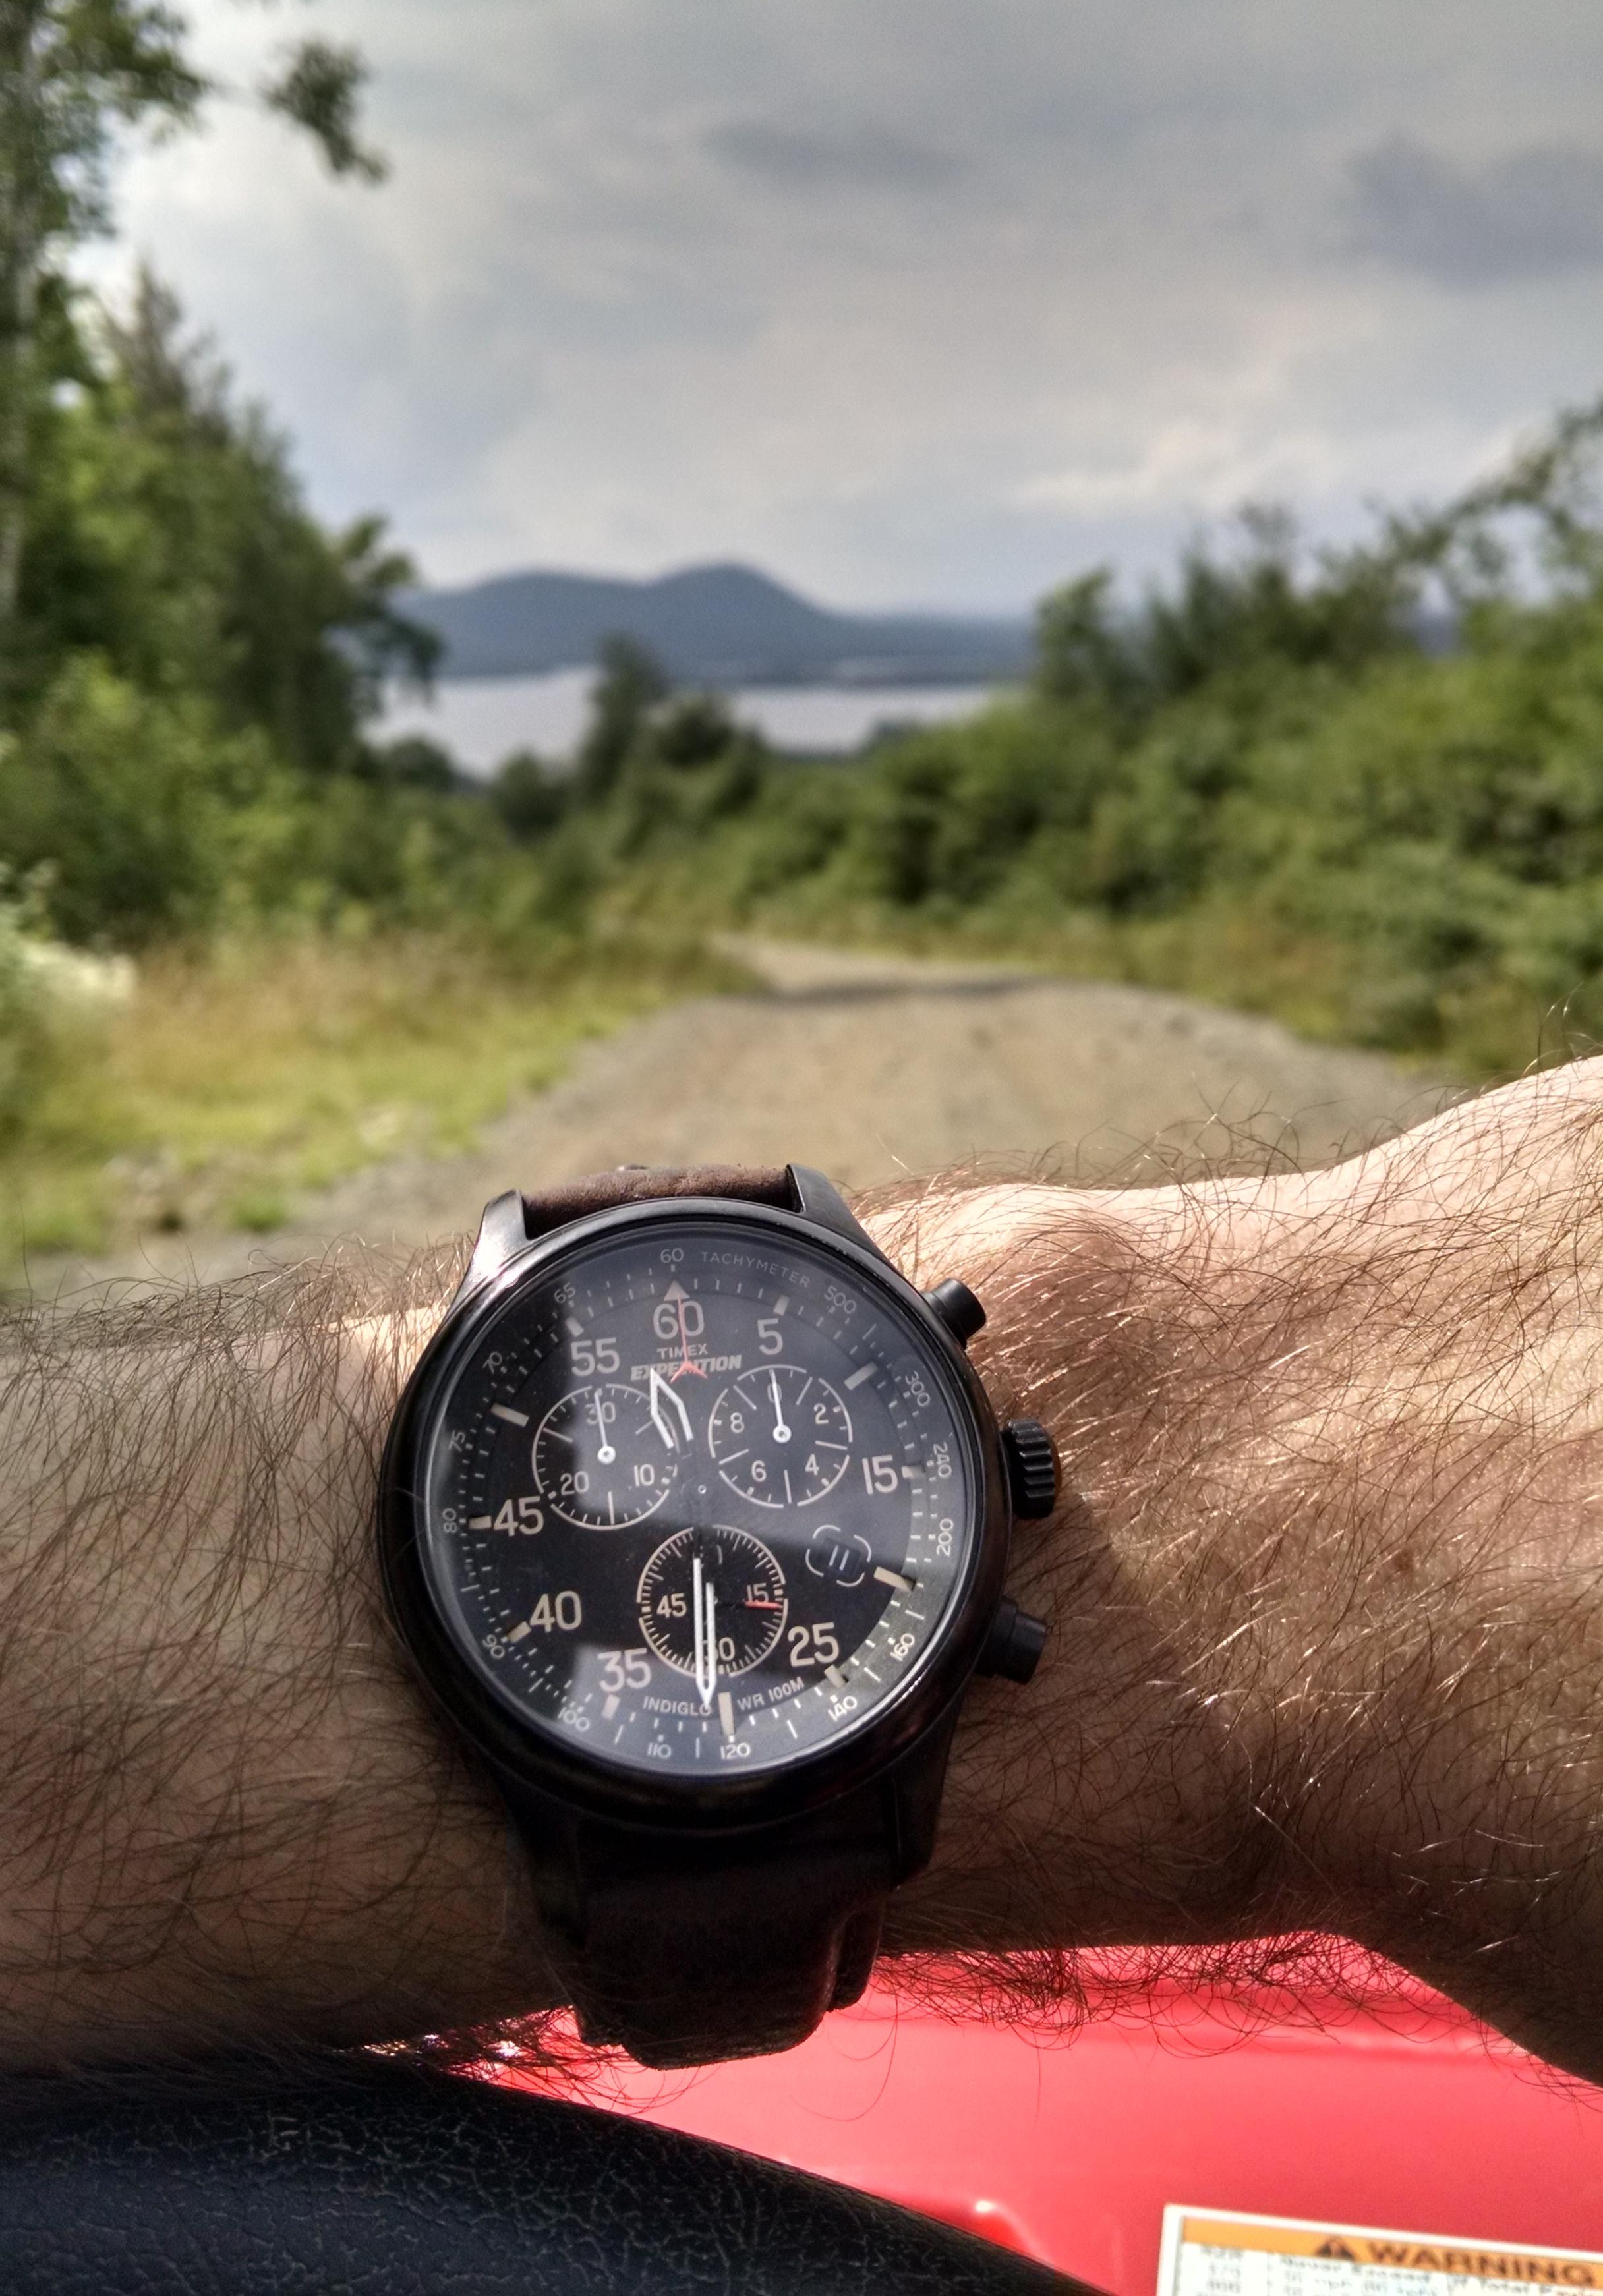 Timex navigator on OHV trails  Moosehead Lake, Greenville, Maine